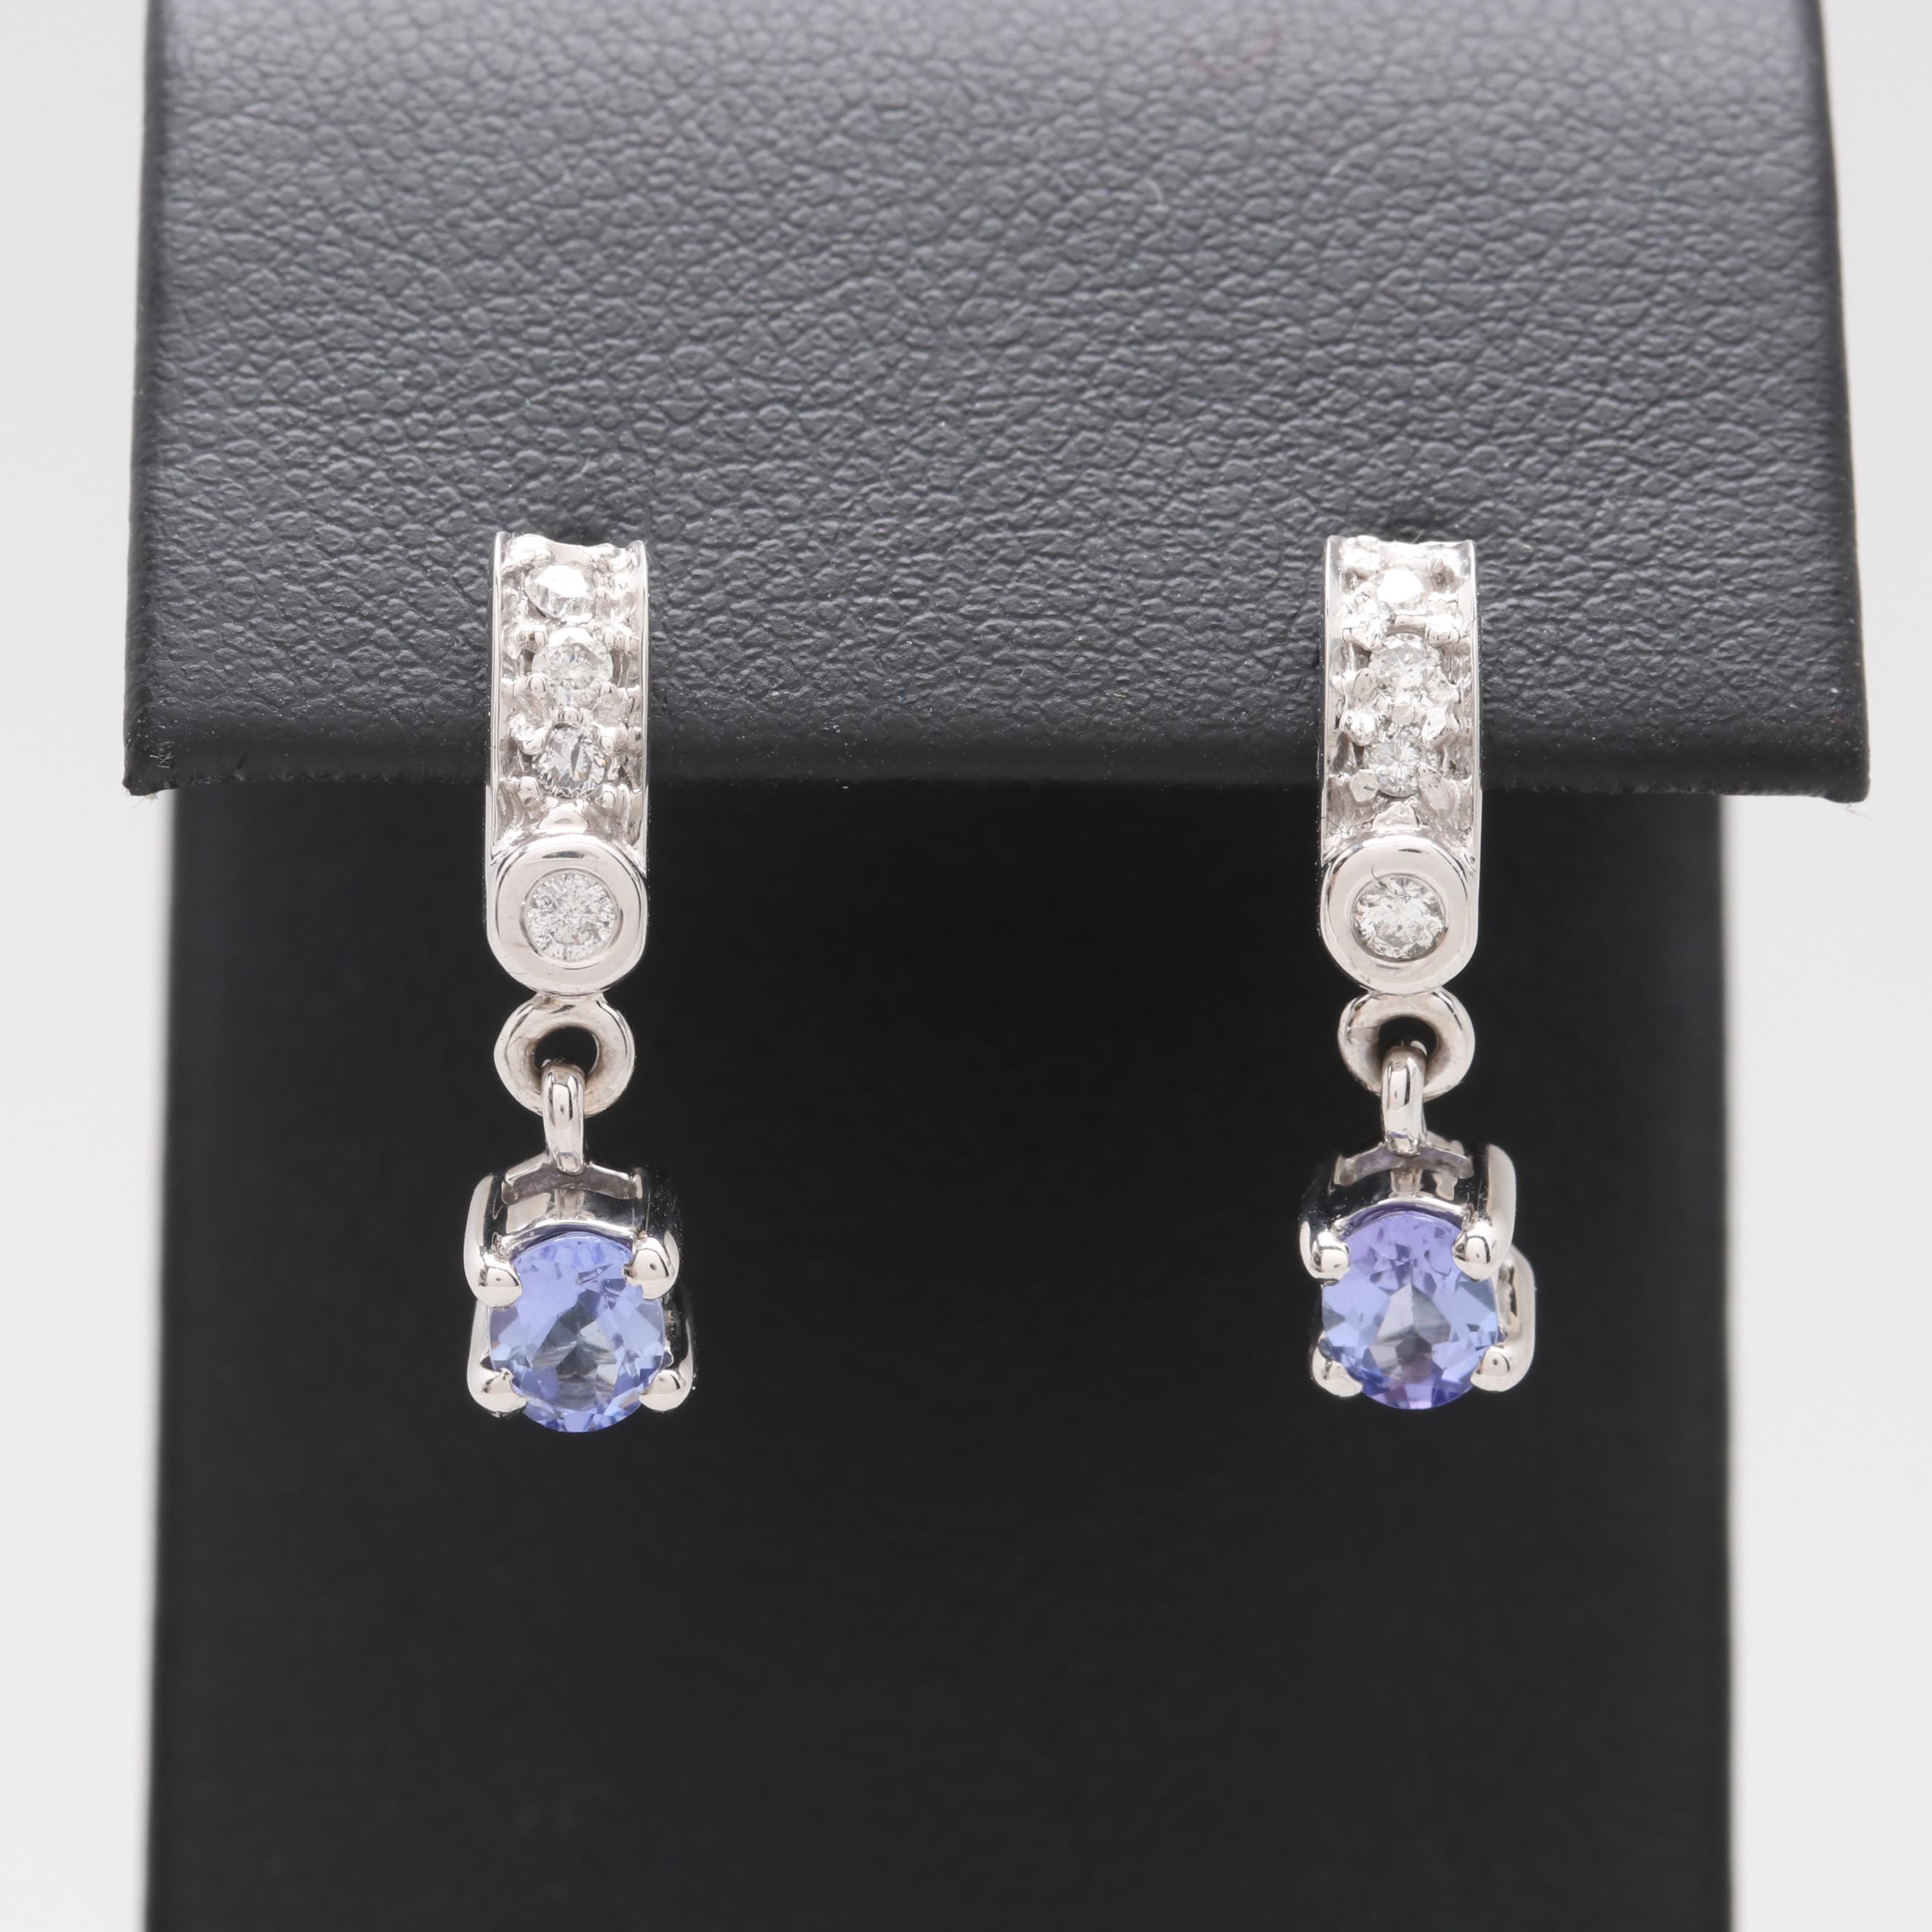 14K White Gold Tanzanite and Diamond Earrings